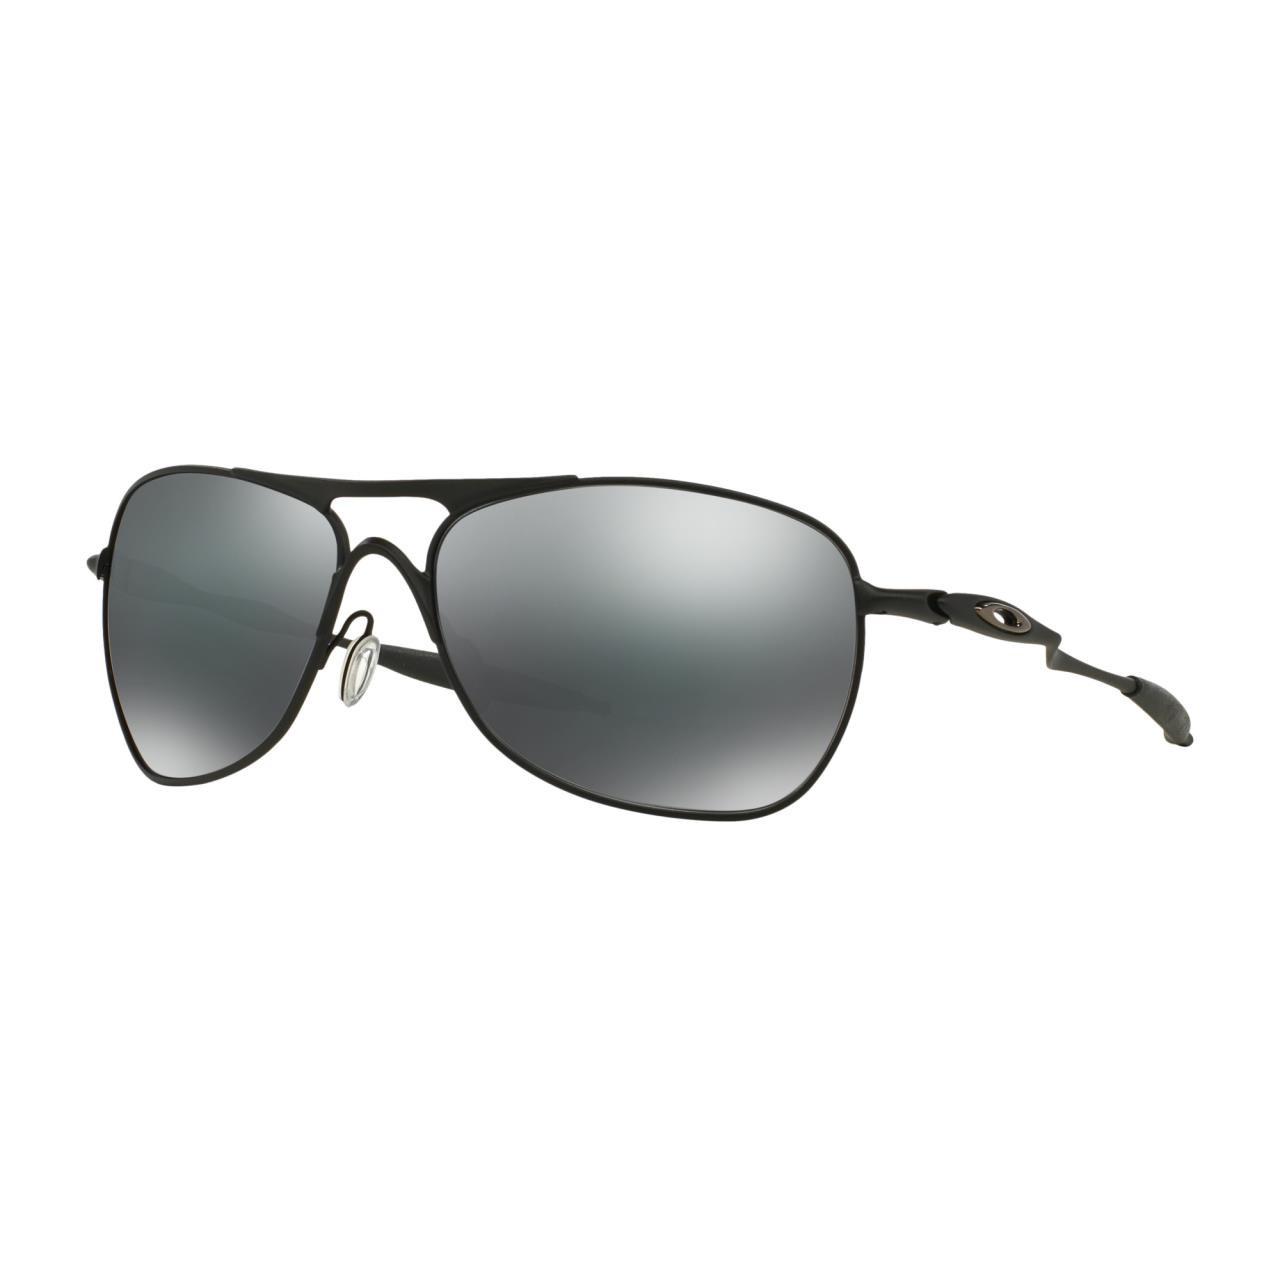 2487d1f882989 Oakley Crosshair  OO4060-03 - GameMasters Outdoors